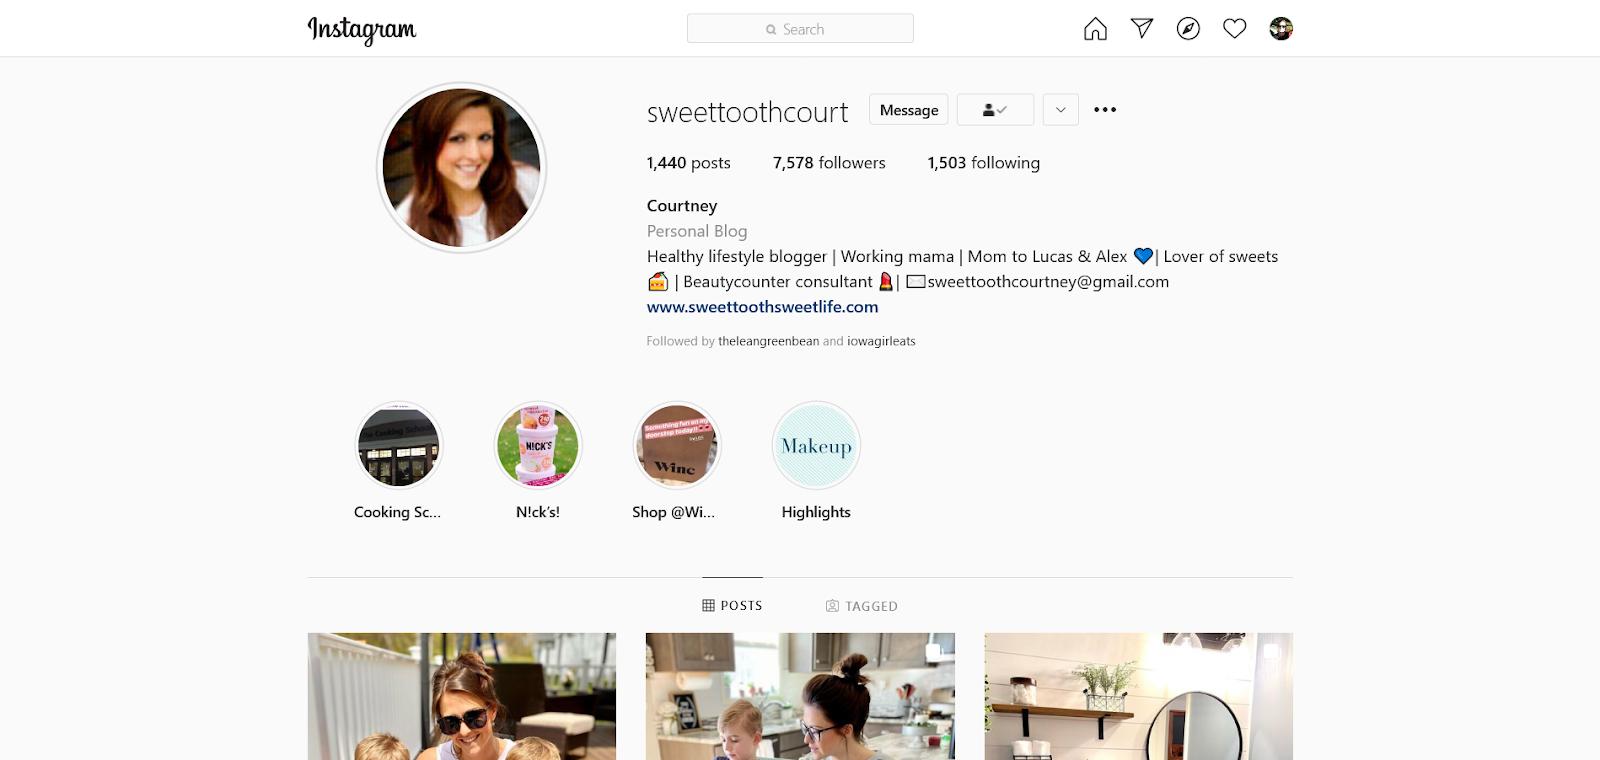 sweettoothcourt instagram bio account